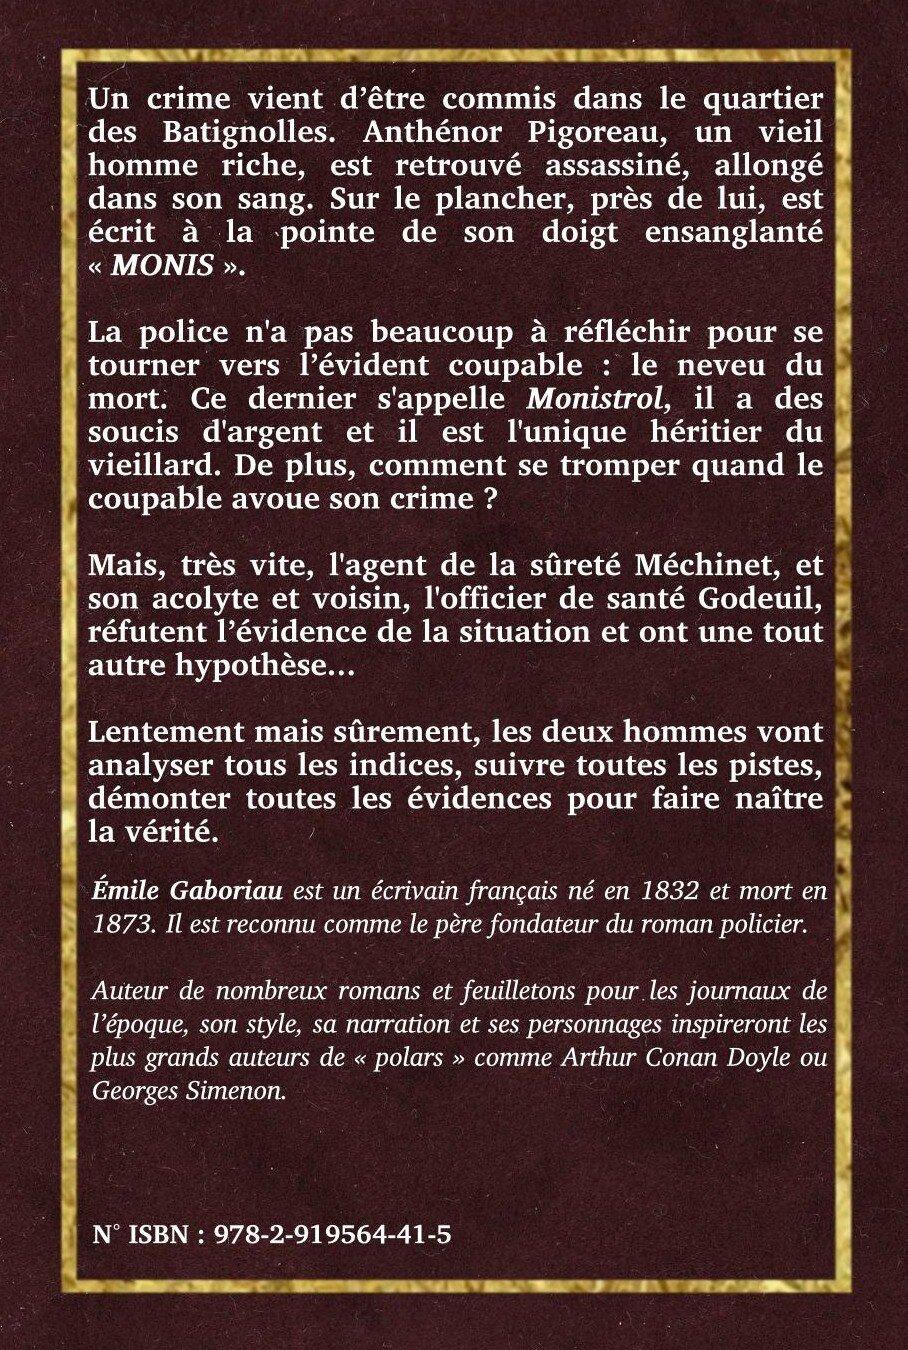 Couv Batignolles-page001